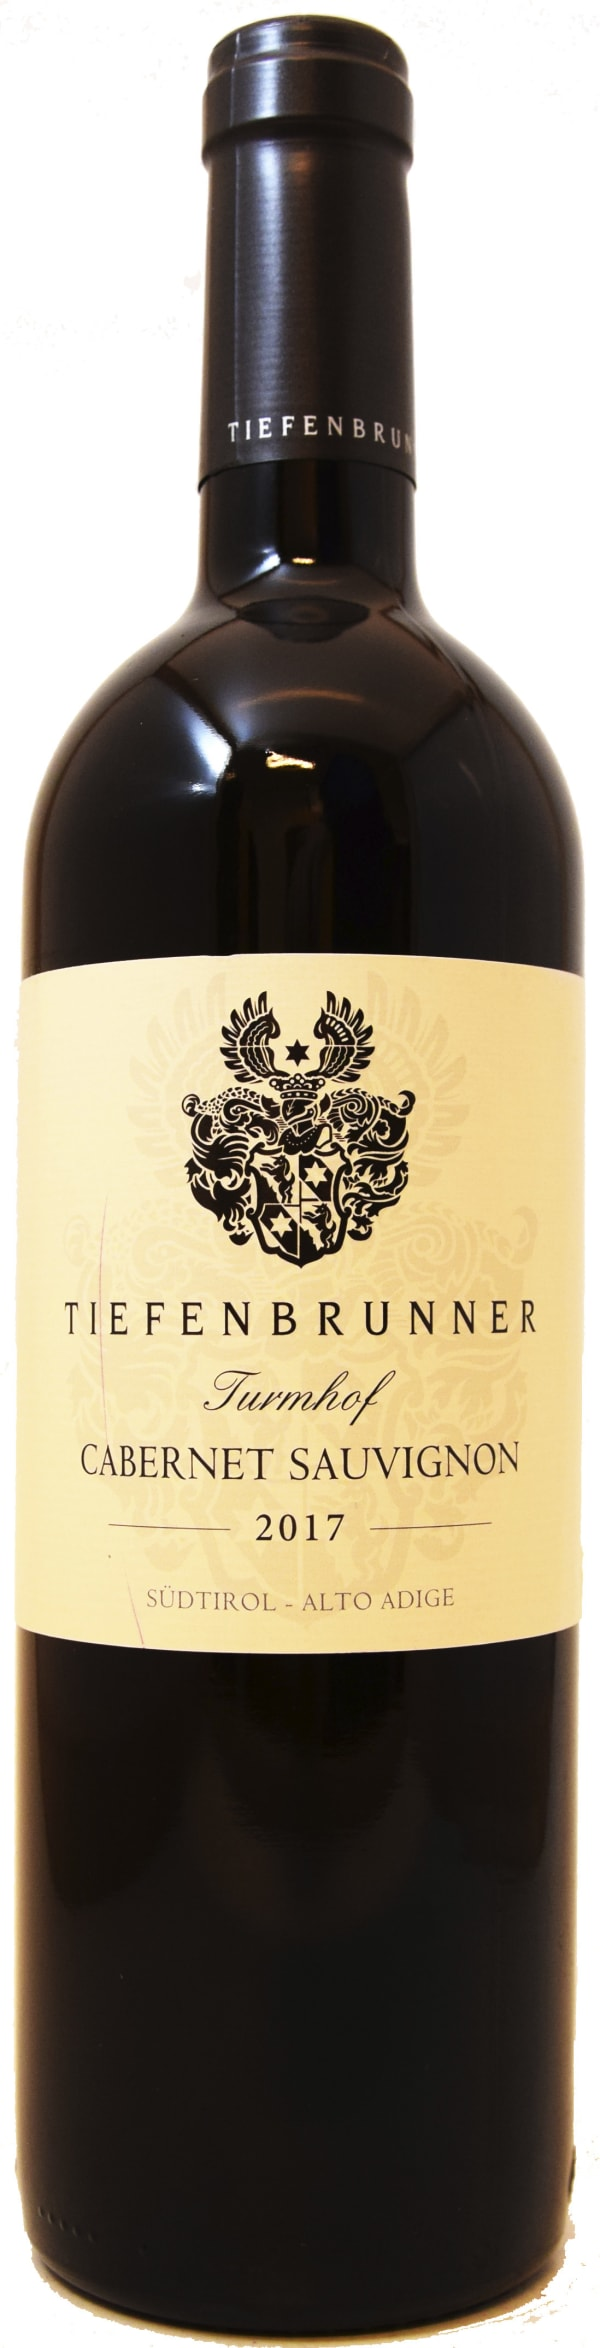 Tiefenbrunner Turmhof Cabernet Sauvignon 2016